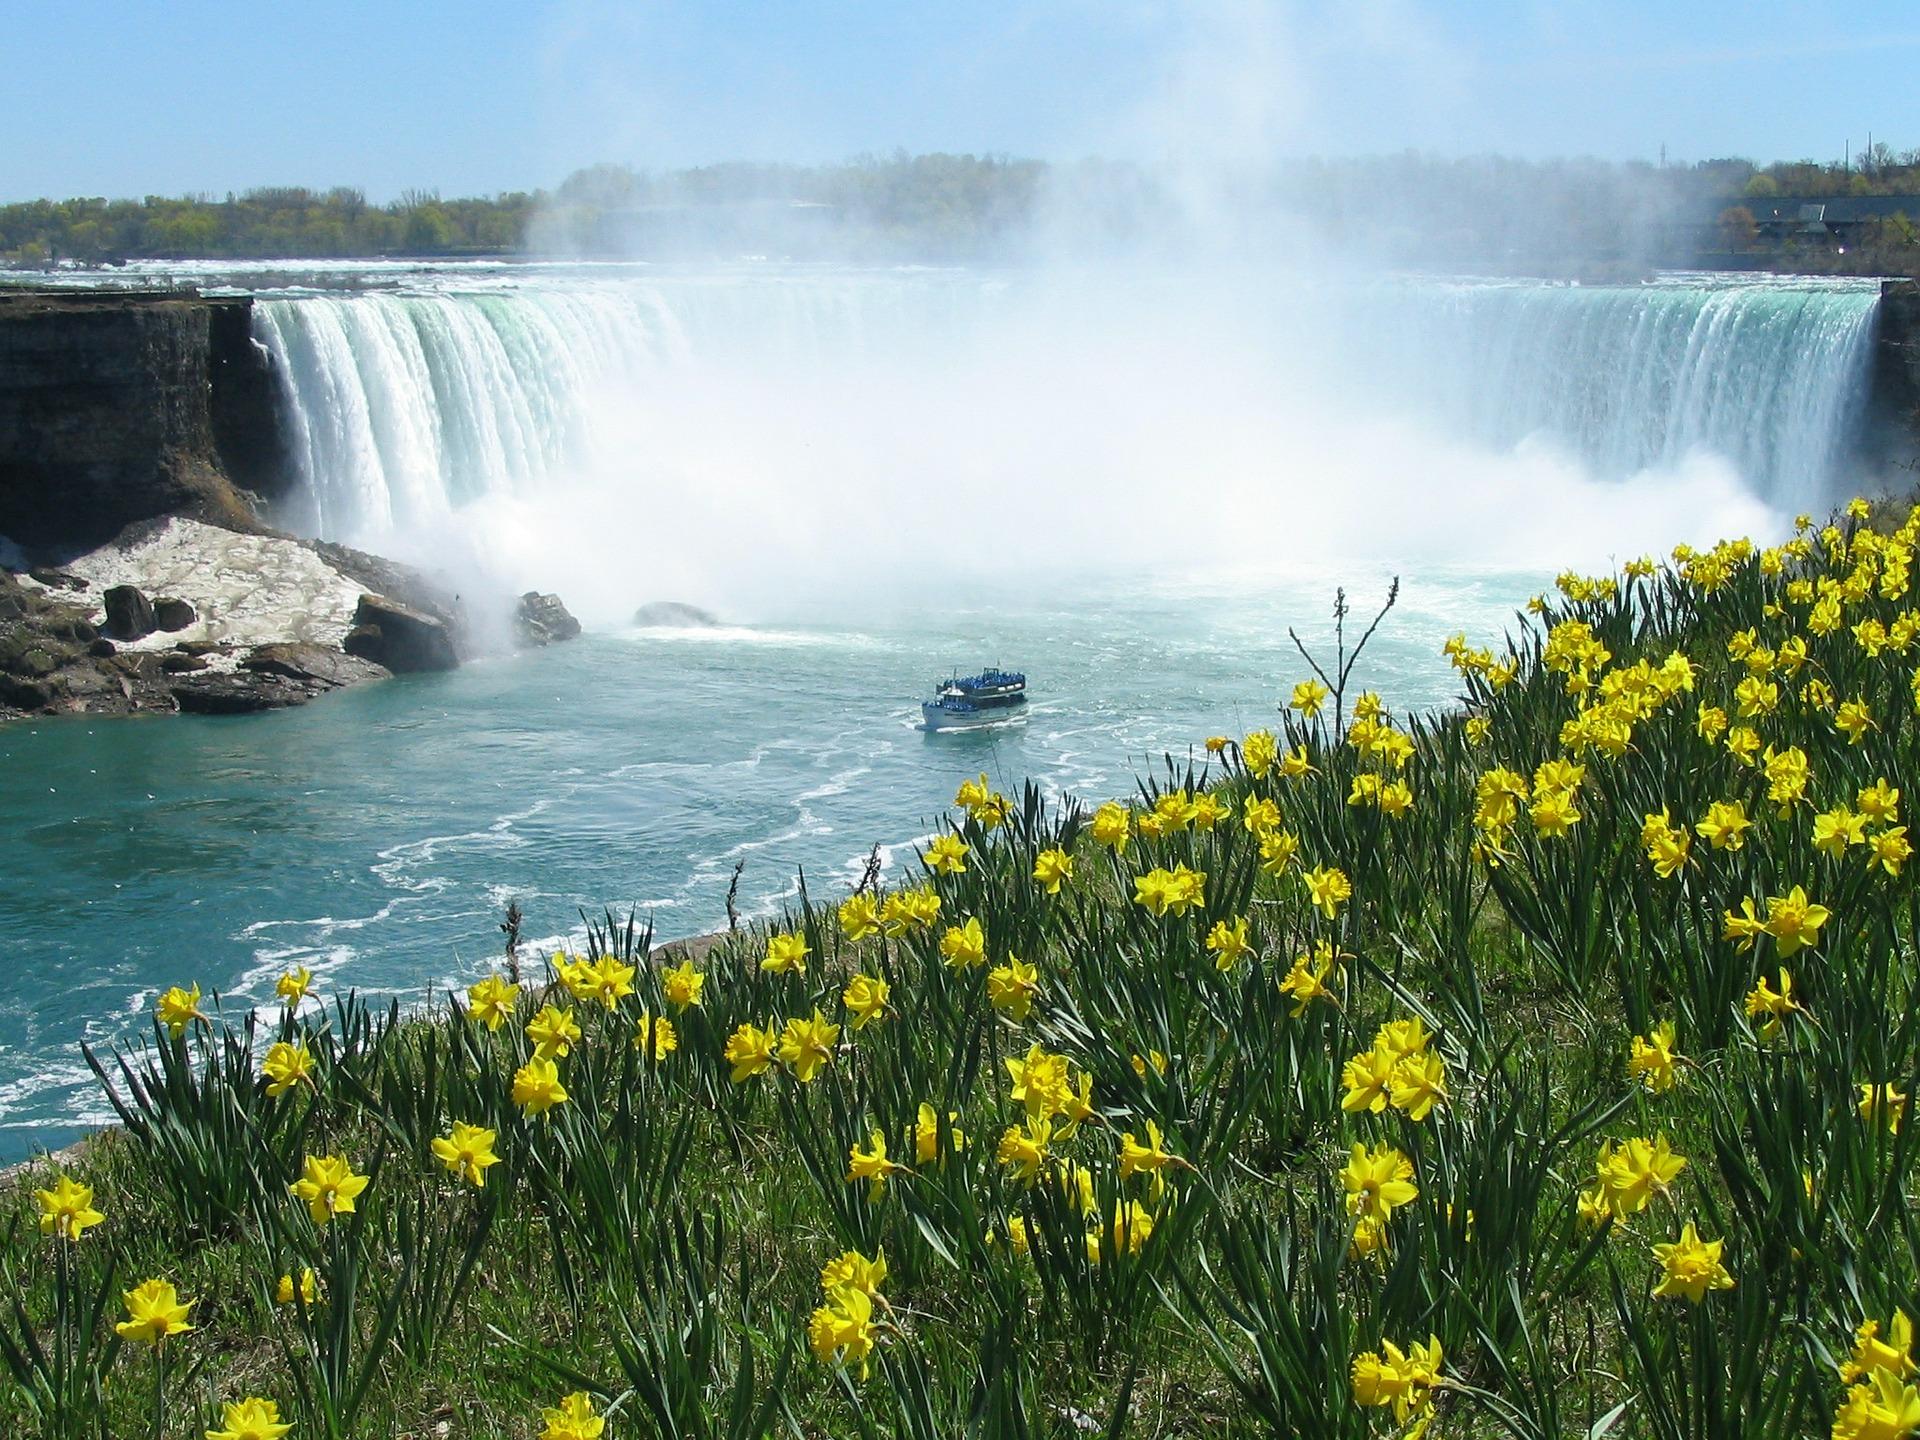 Travailler autrement au Canada-Les chutes du Niagara